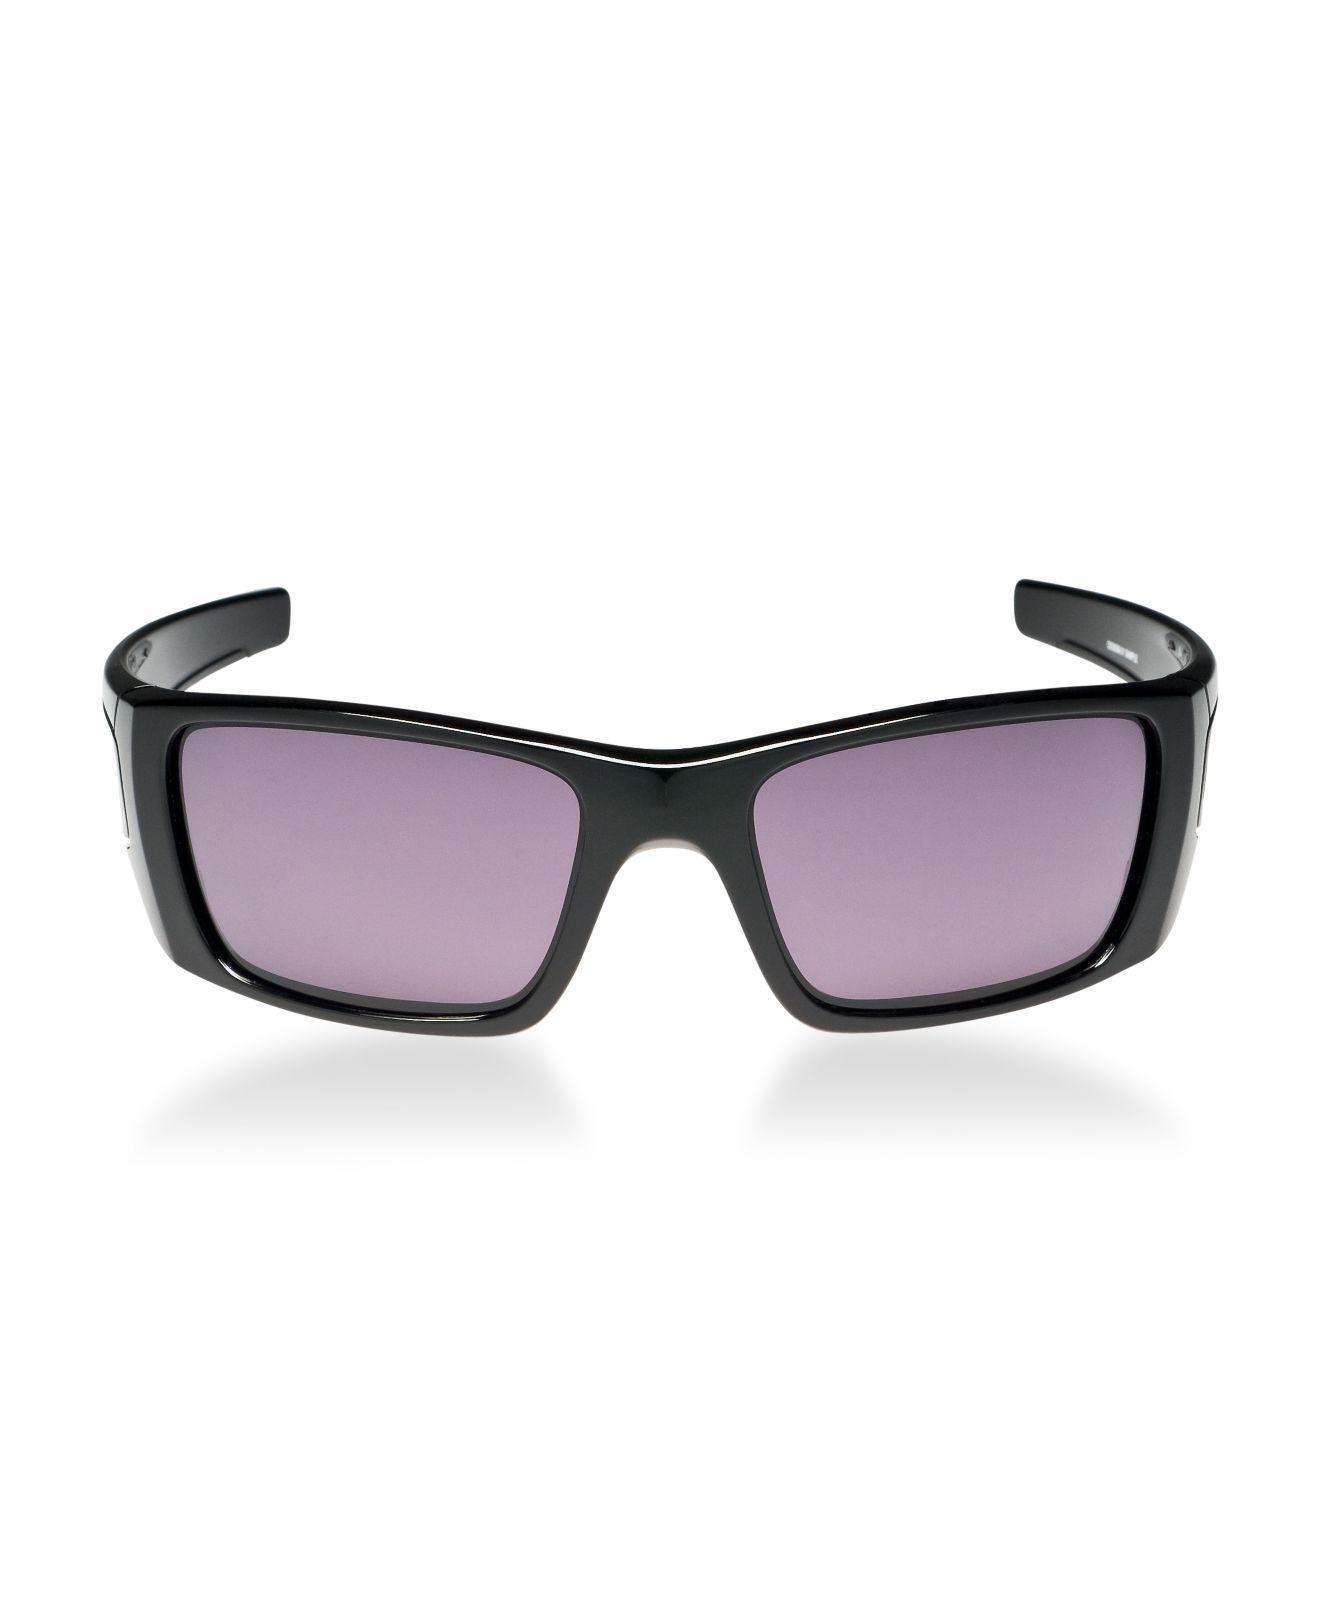 c01799b4b9 Lyst - Oakley Sunglasses